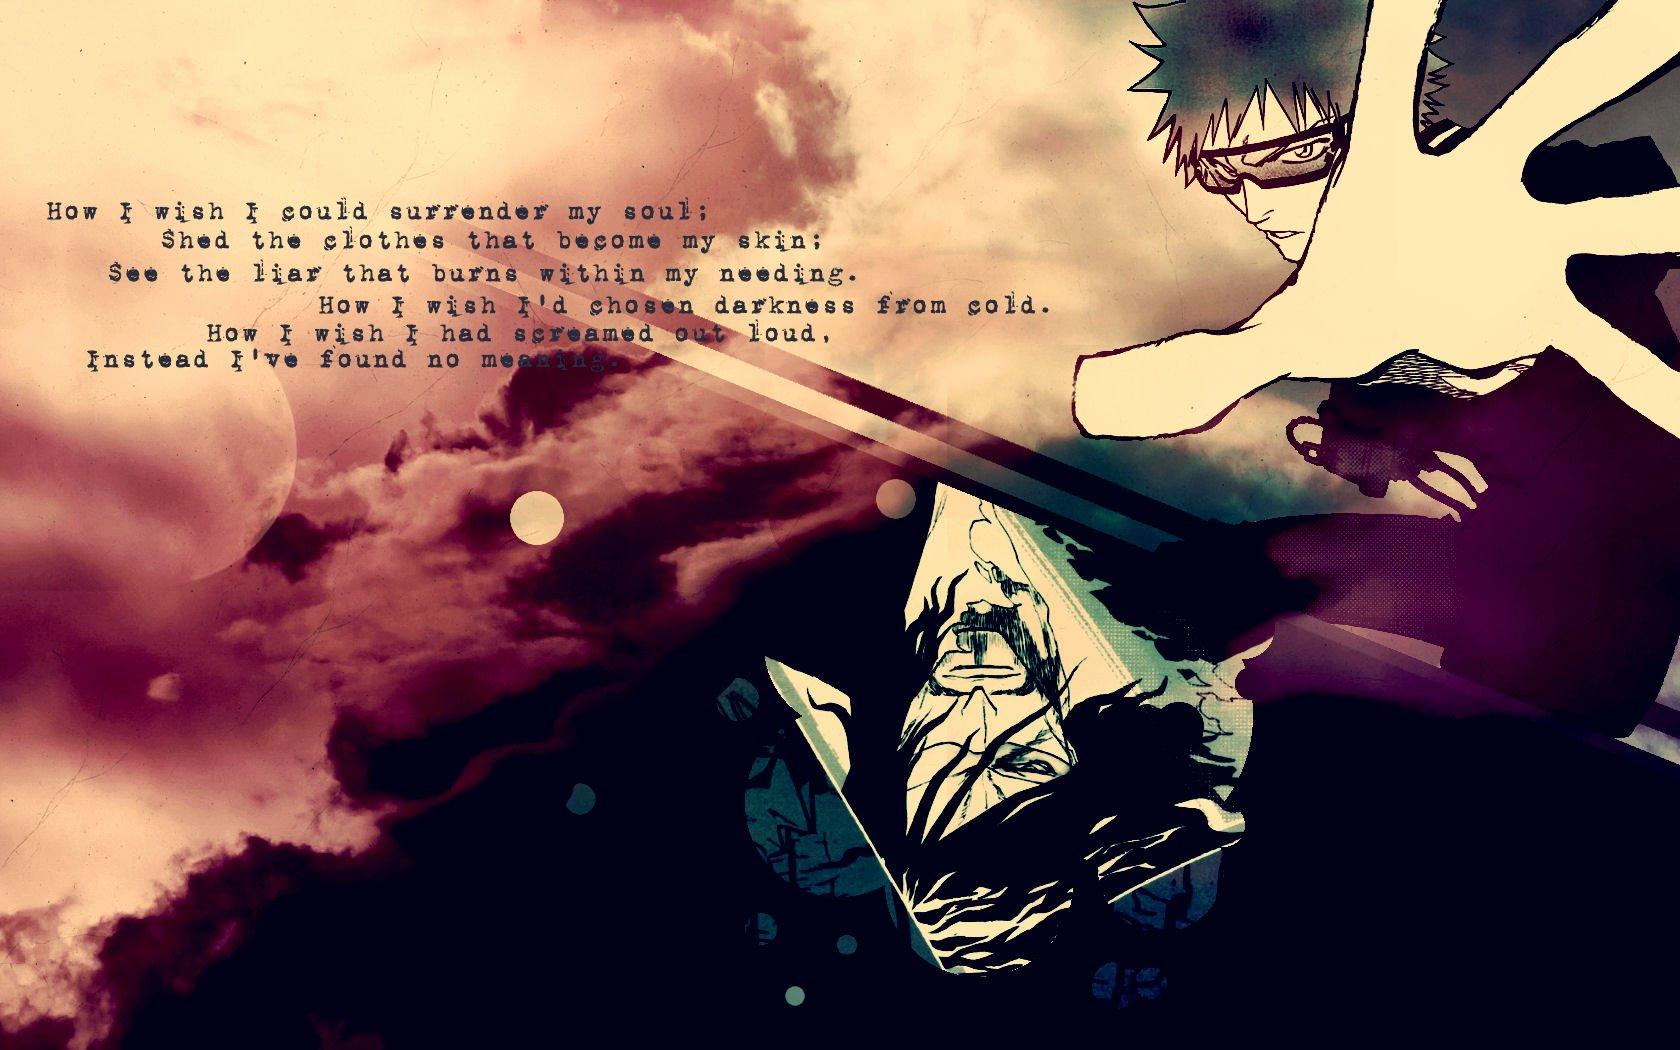 Bleach kurosaki ichigo quotes anime zangetsu wallpaper - Anime quotes wallpaper ...